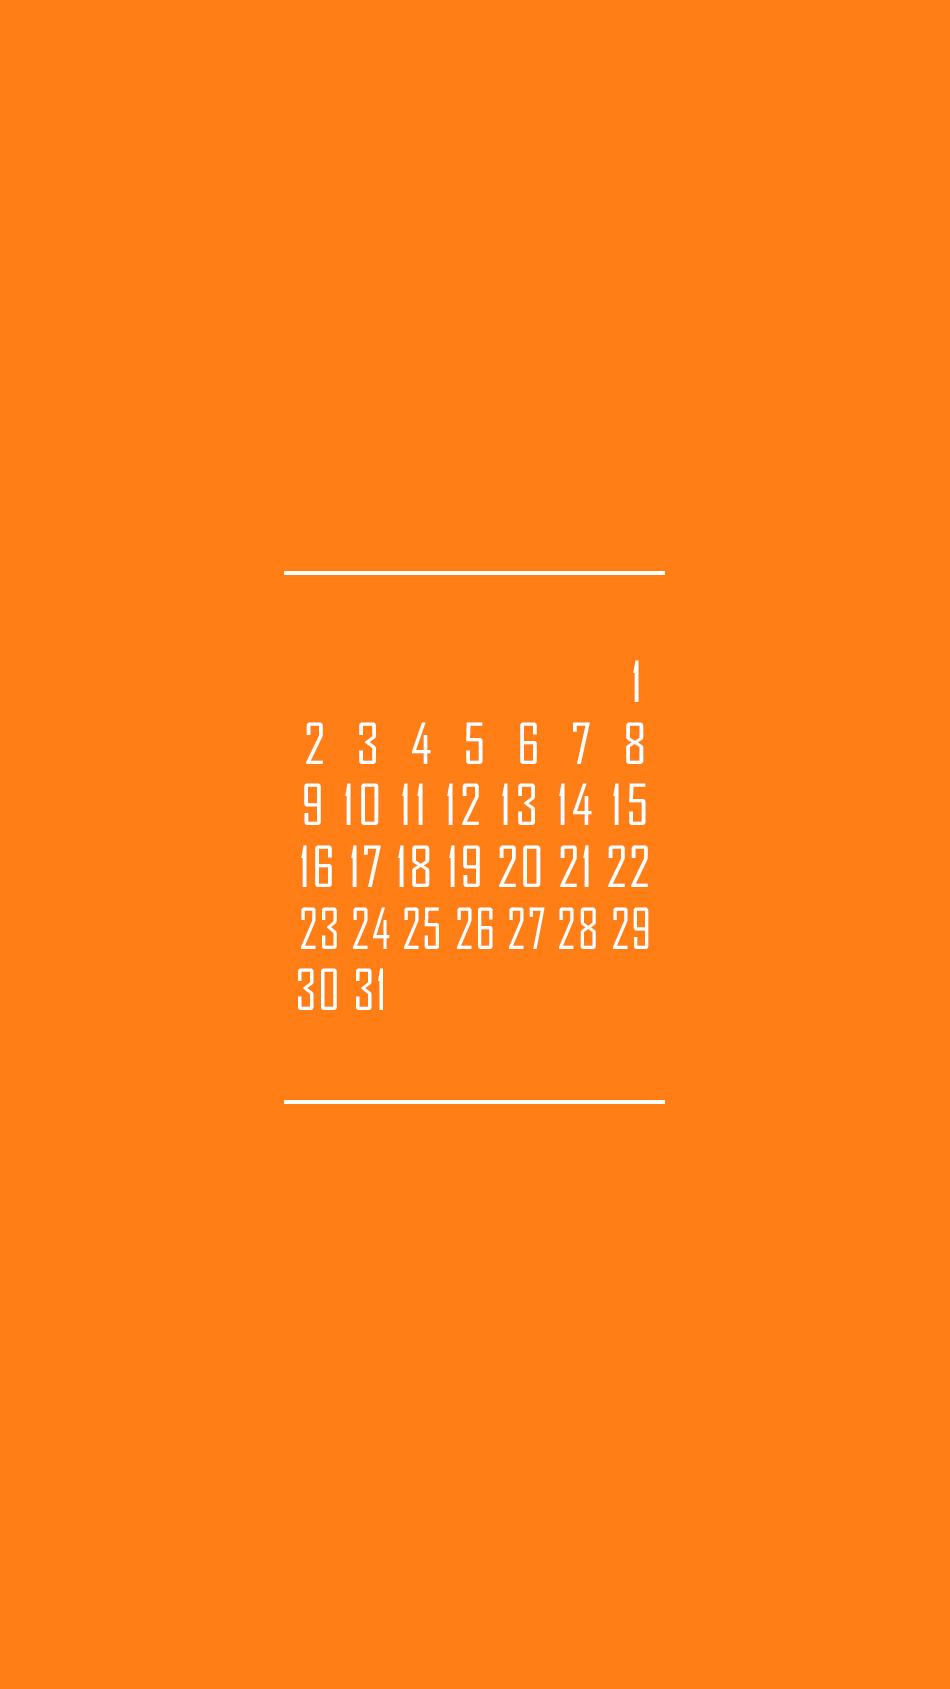 календарь на август district-f.org